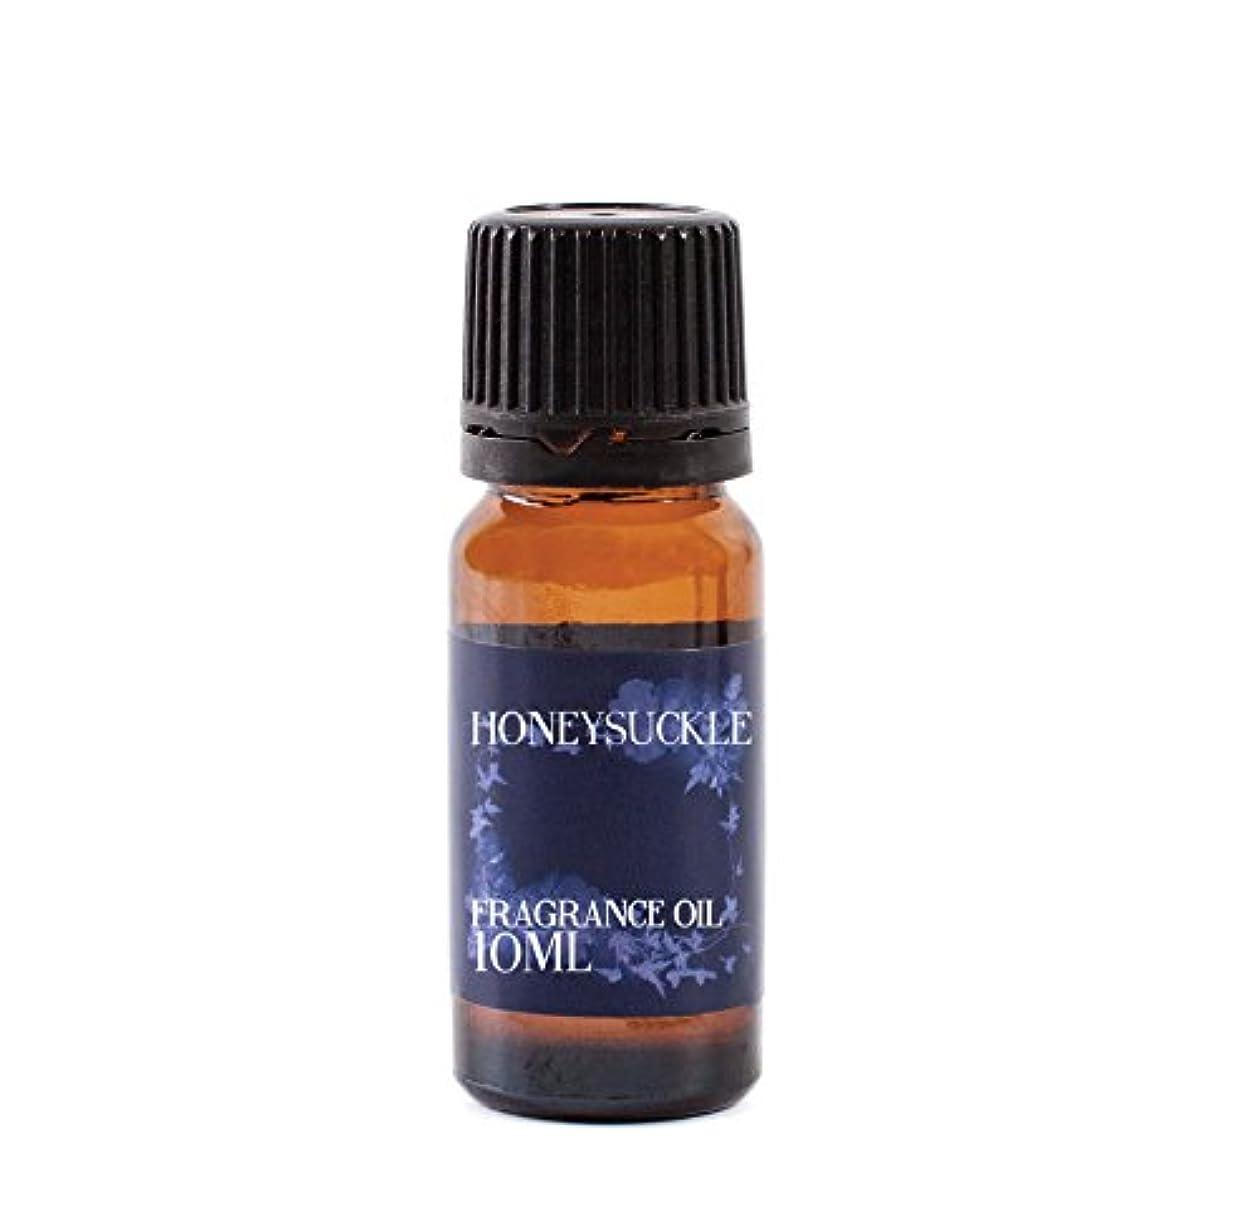 Mystic Moments | Honeysuckle Fragrance Oil - 10ml